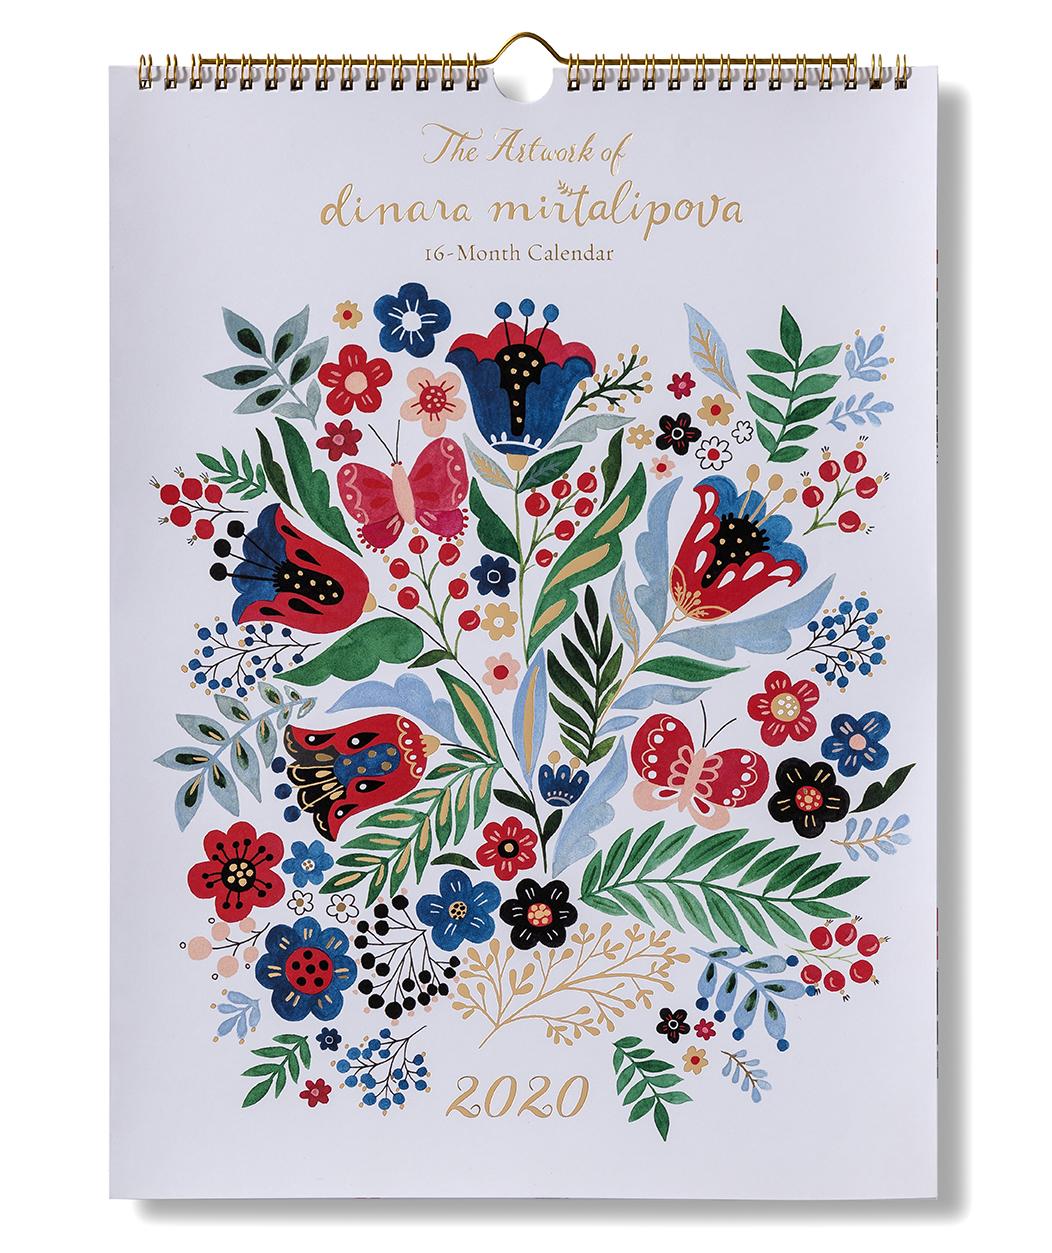 High_Note_Dinara_Mirtalipova_Wall_Calendar1.jpg